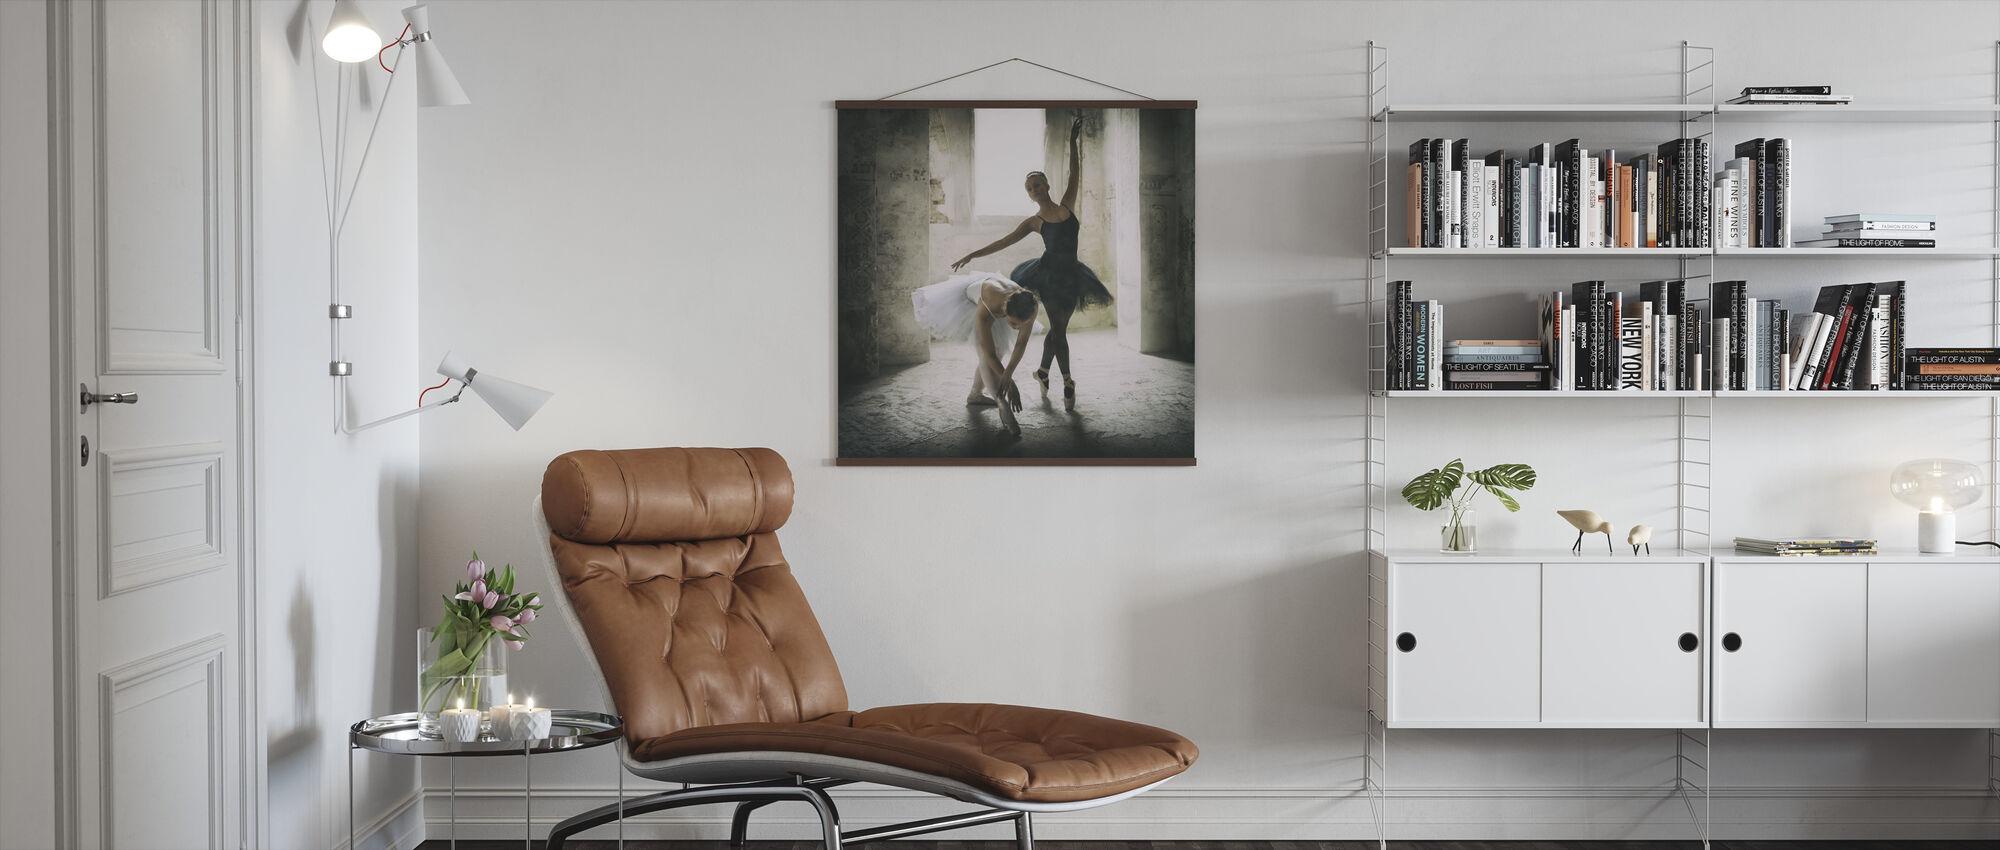 Den subtila bågen - Poster - Vardagsrum